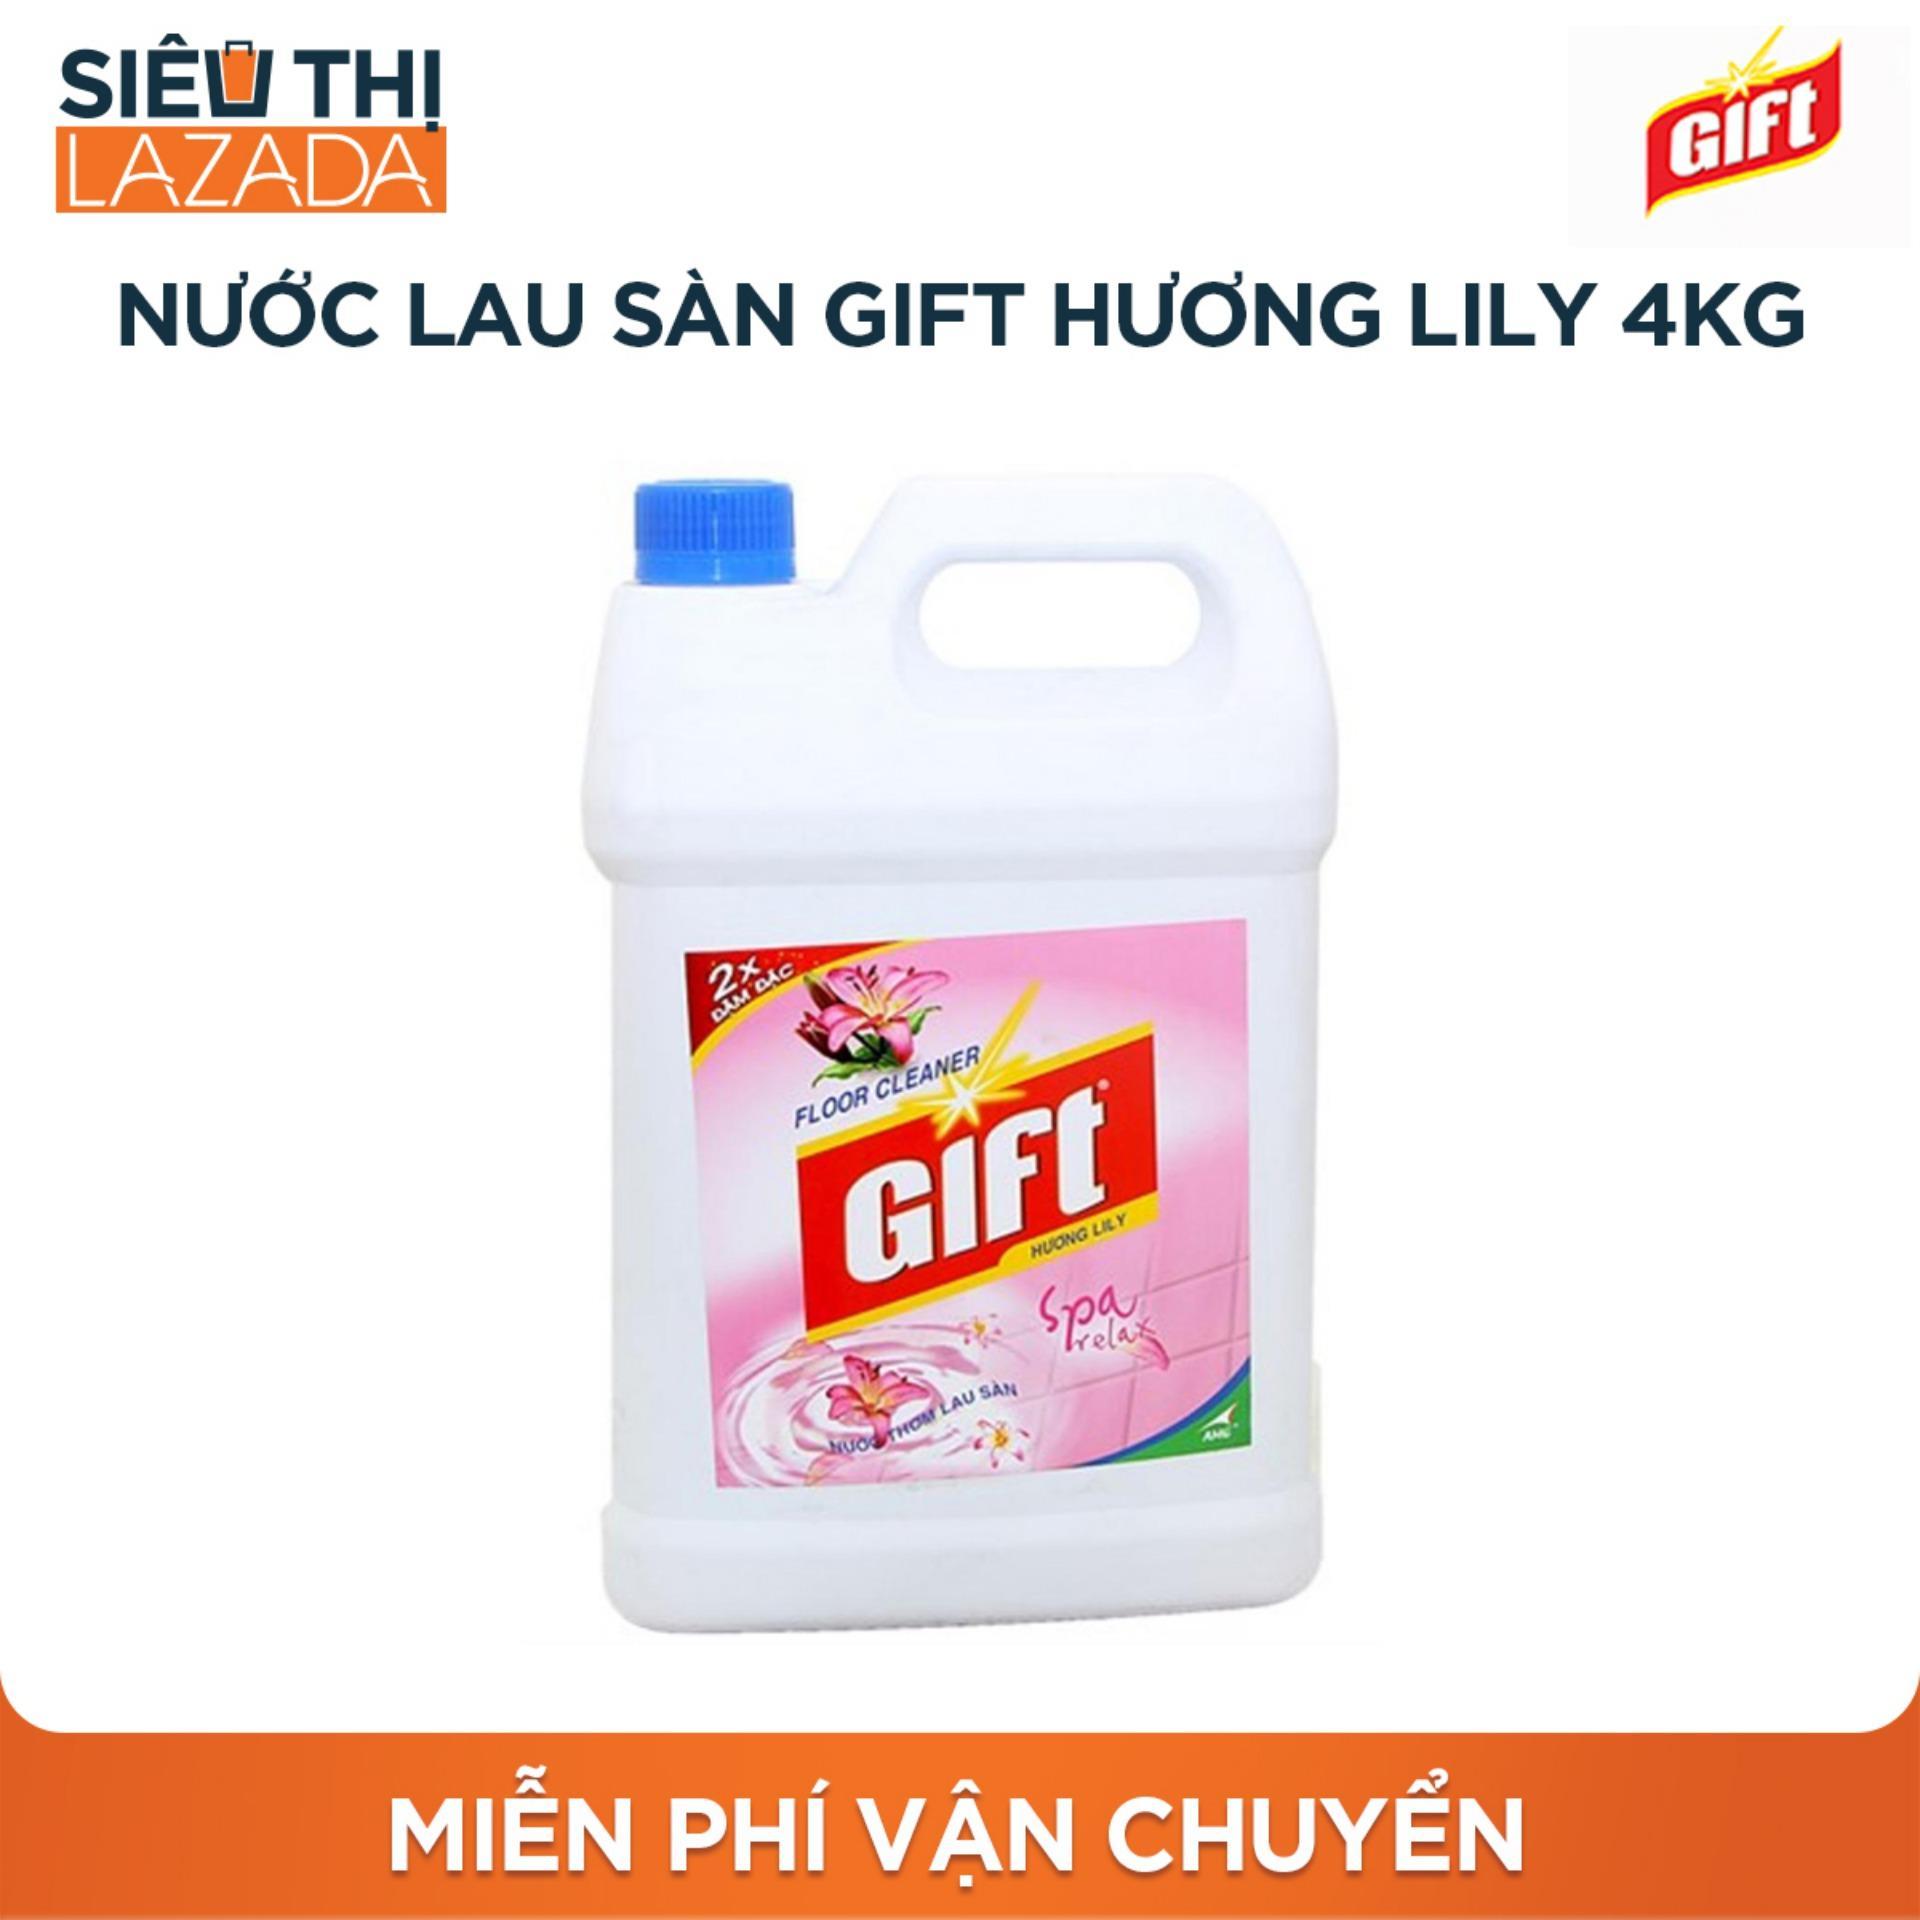 Nước Lau Sàn Gift Hương Lily 4kg By Lazada Retail Lazada Supermarket.